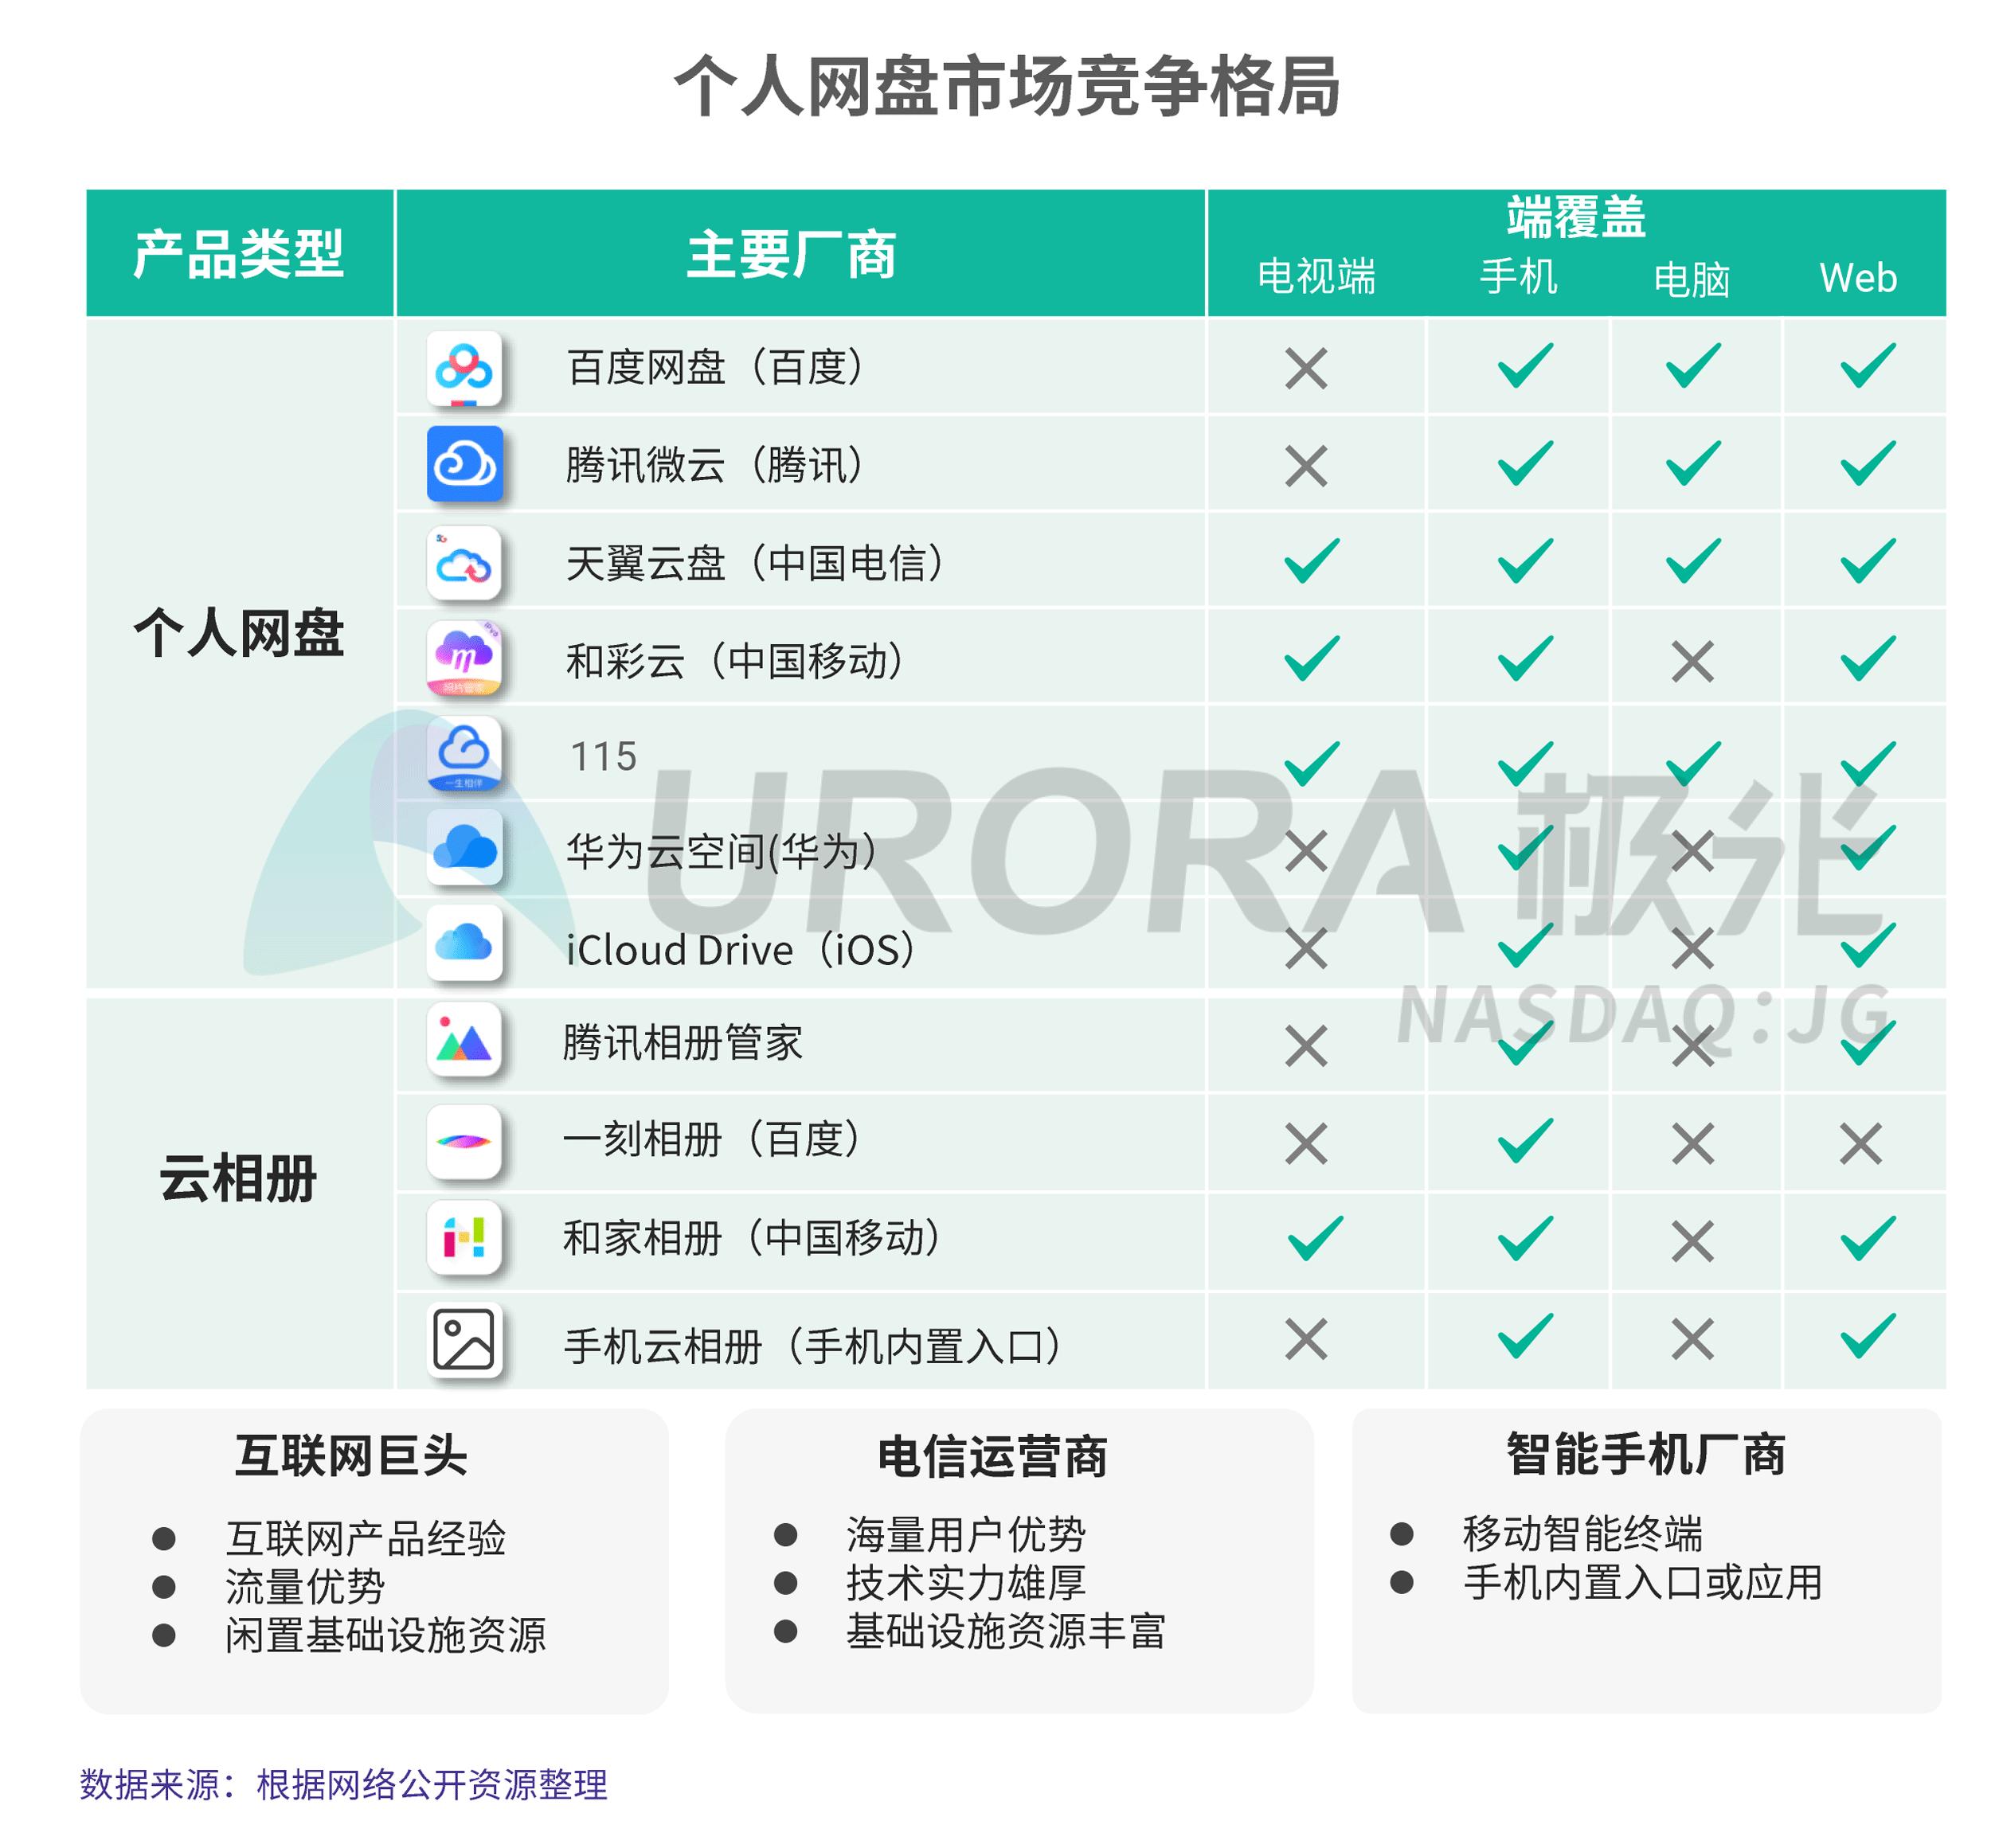 JIGUANG-个人网盘行业研究报告-final---切图版2-11.png